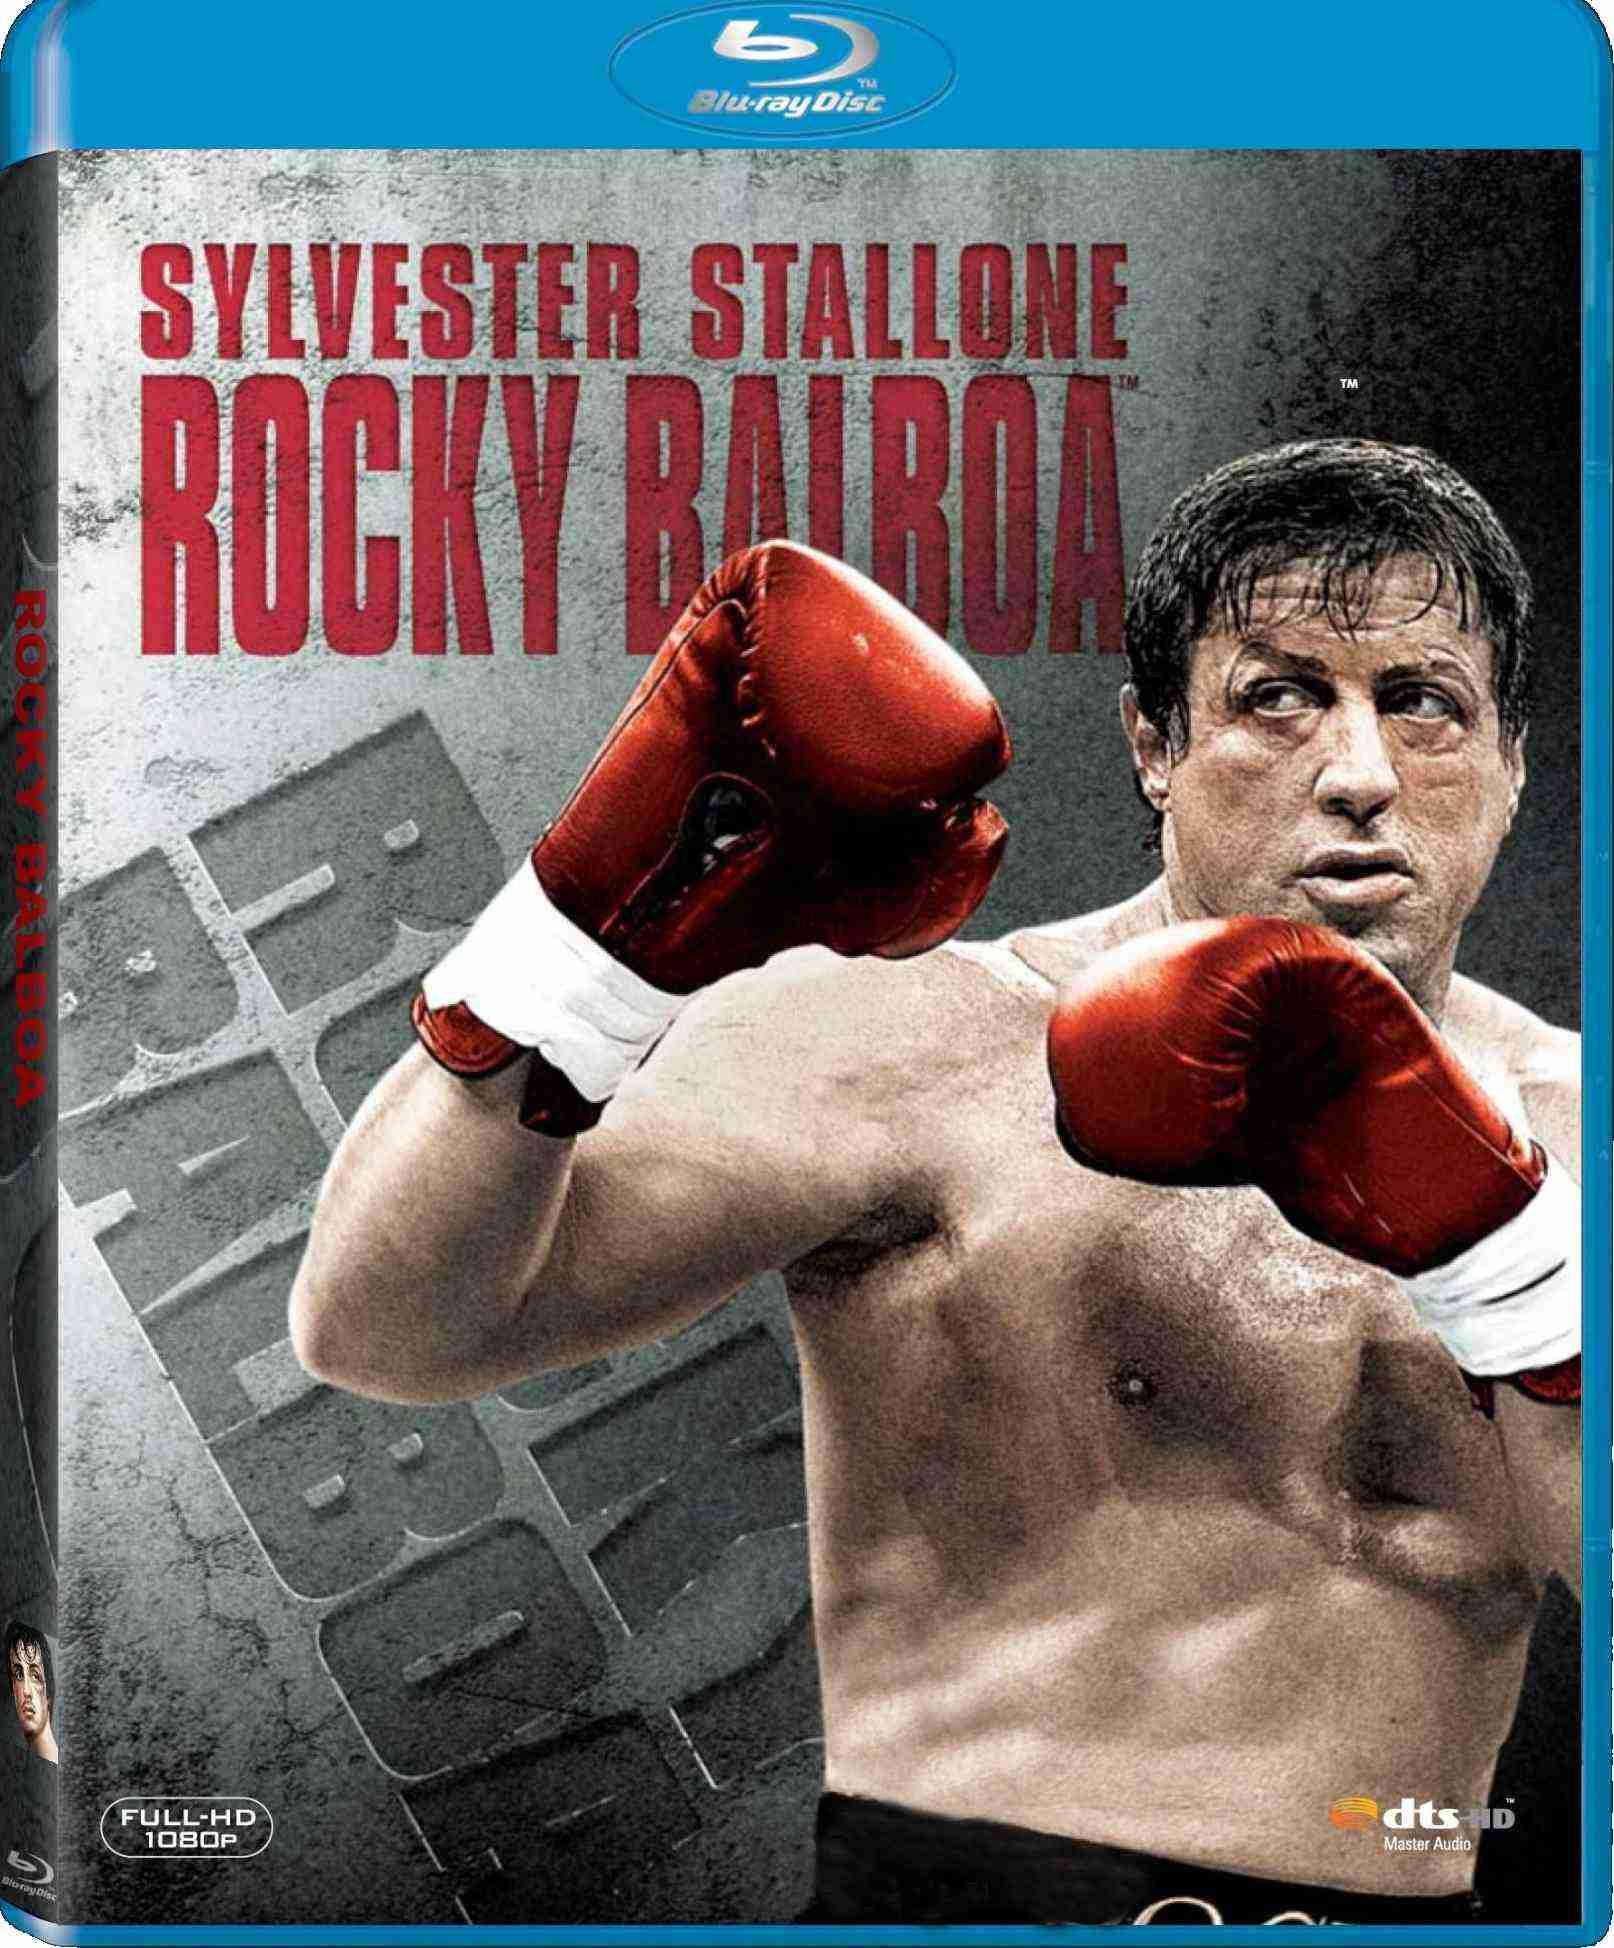 ROCKY BALBOA - Blu-ray